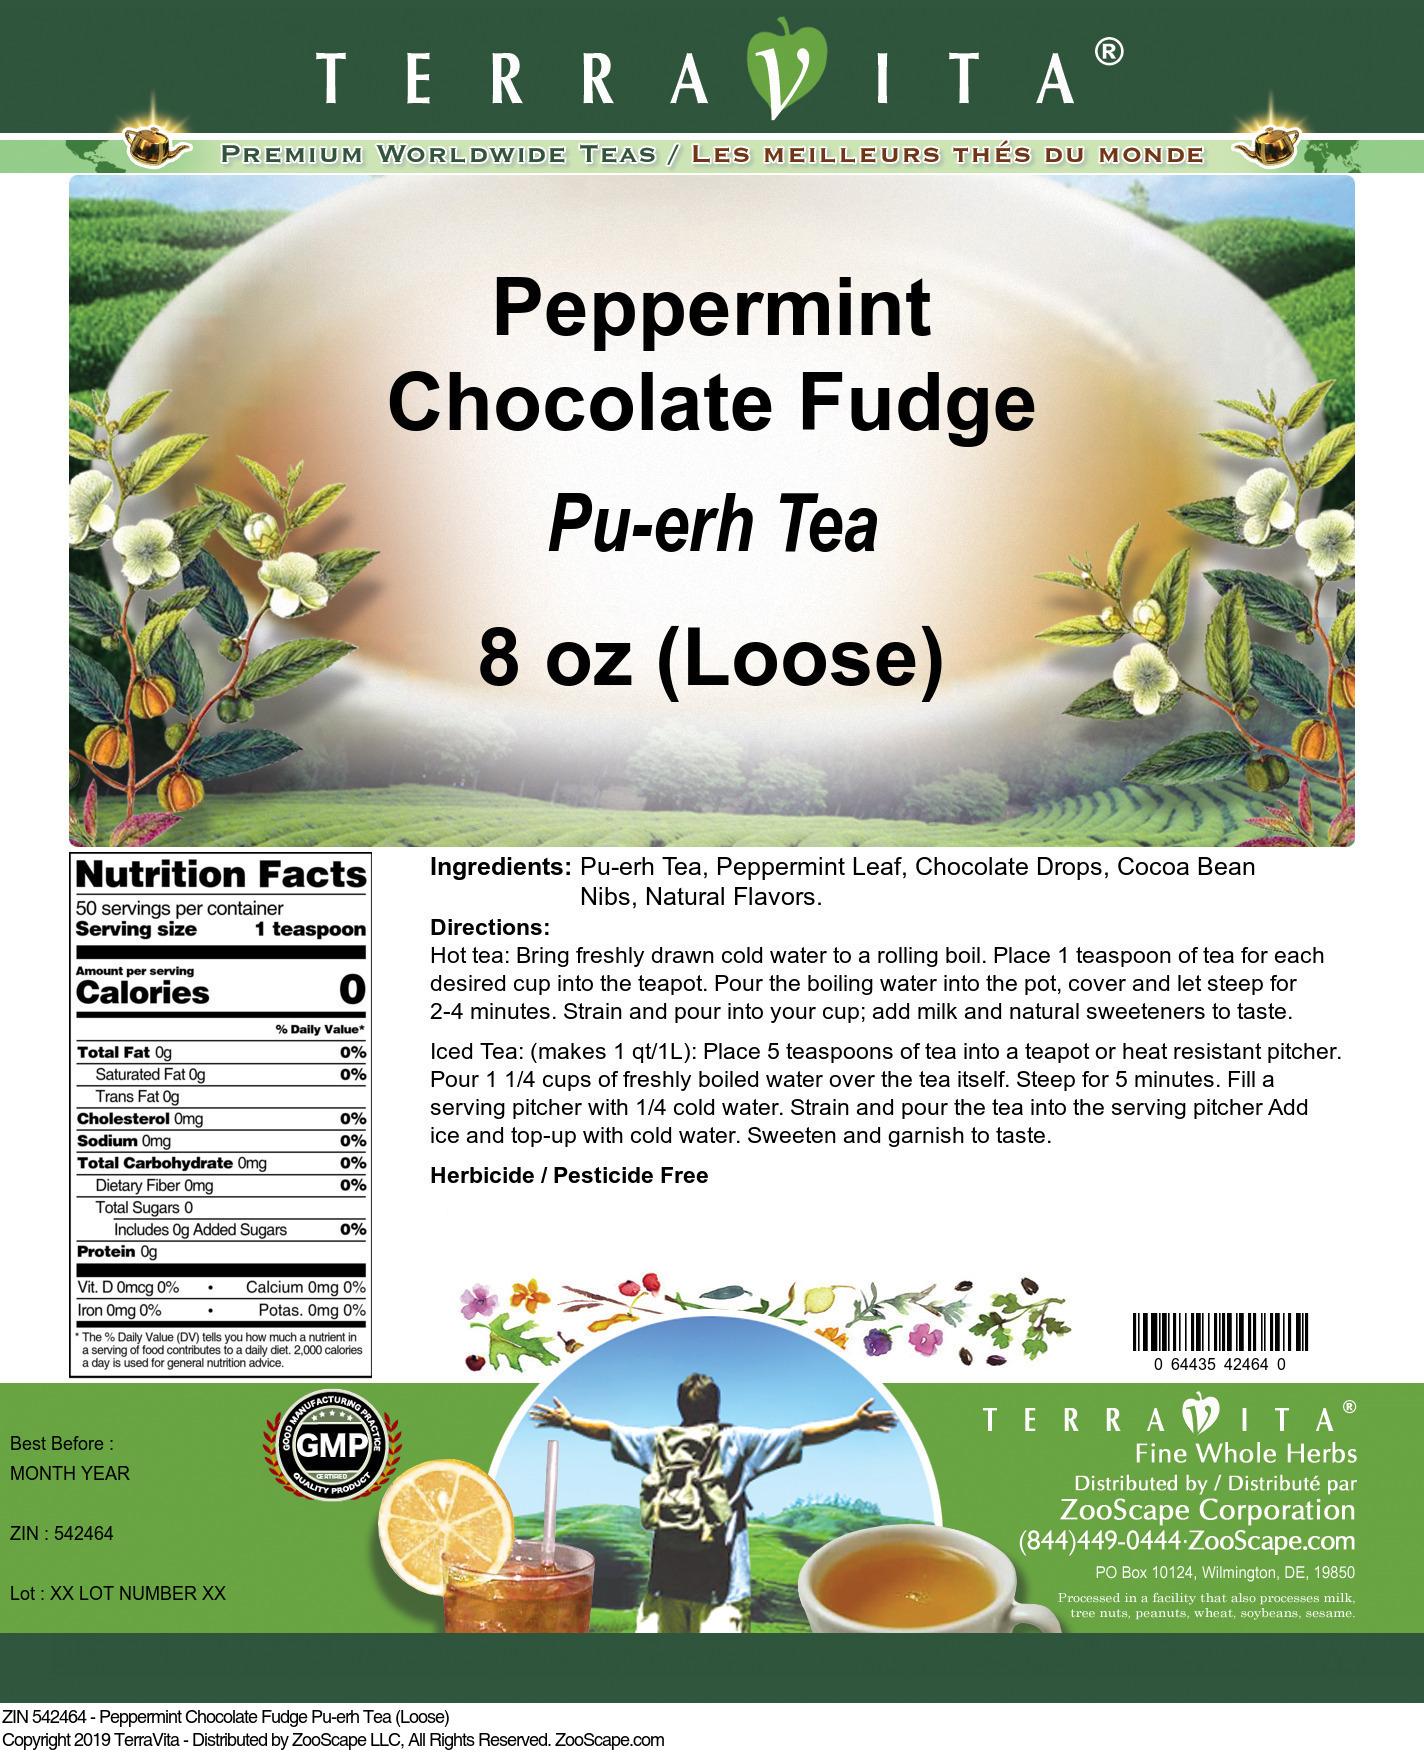 Peppermint Chocolate Fudge Pu-erh Tea (Loose)